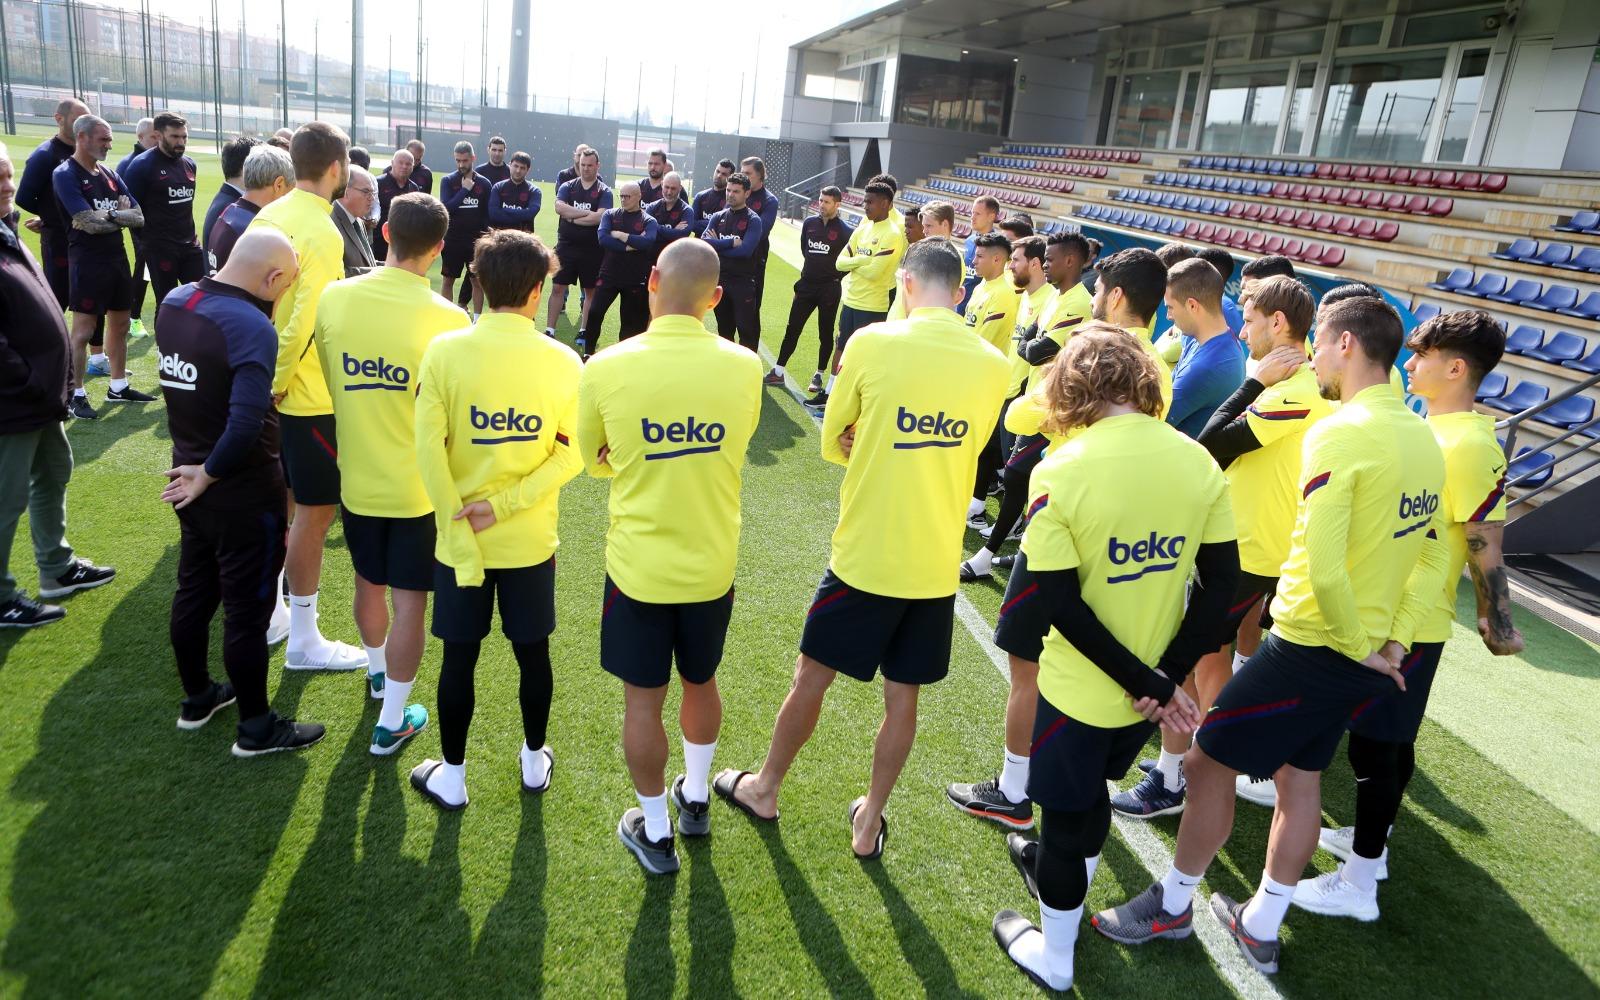 FC Barcelona's first team, training in the Ciudad Deportiva Joan Gamper / FC BARCELONA